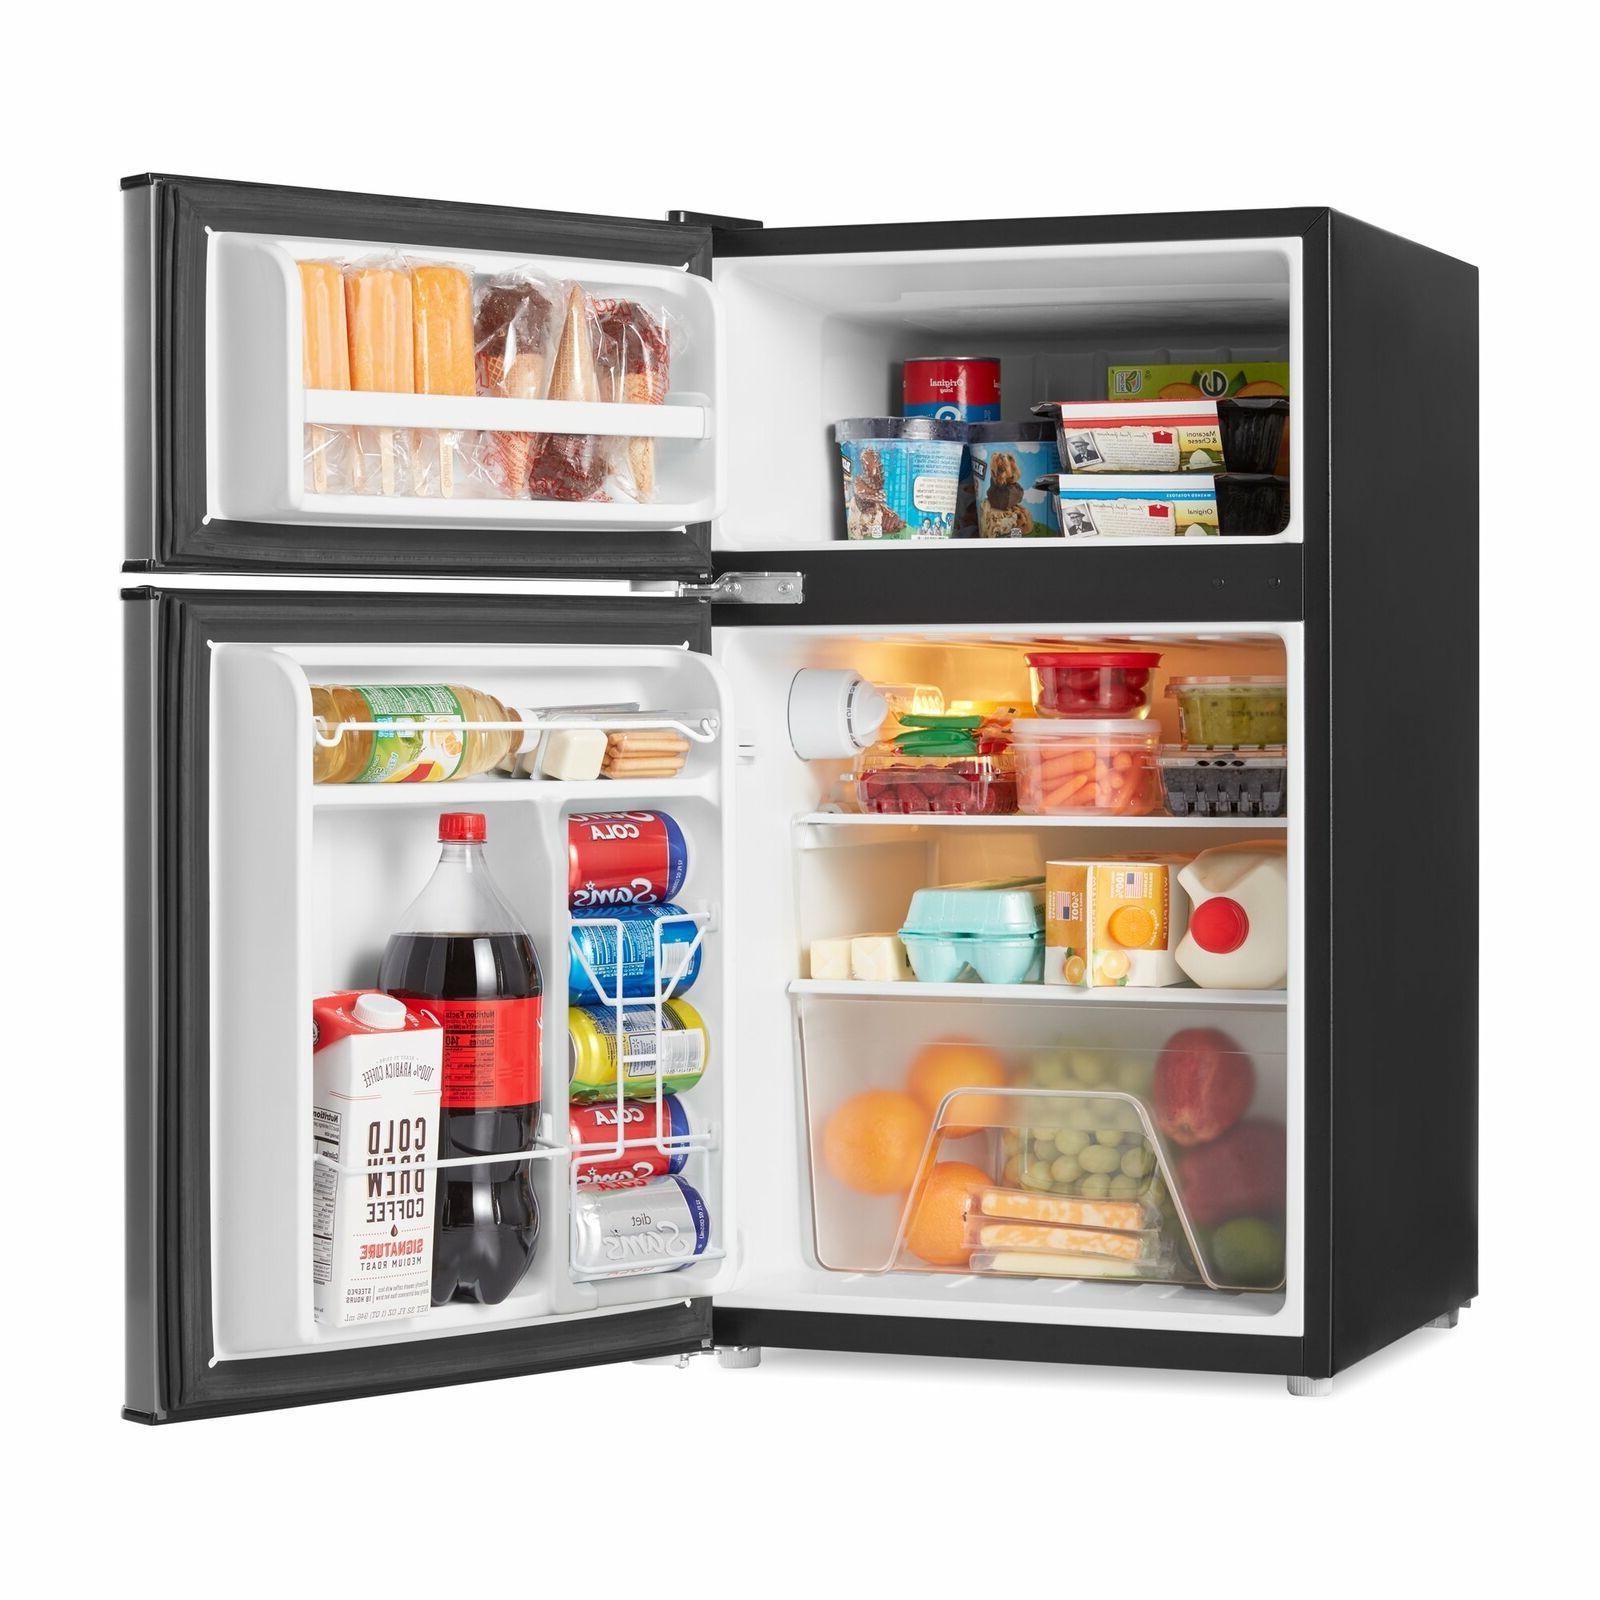 New 3.1 Cu ft Two Mini With Freezer Estar Black